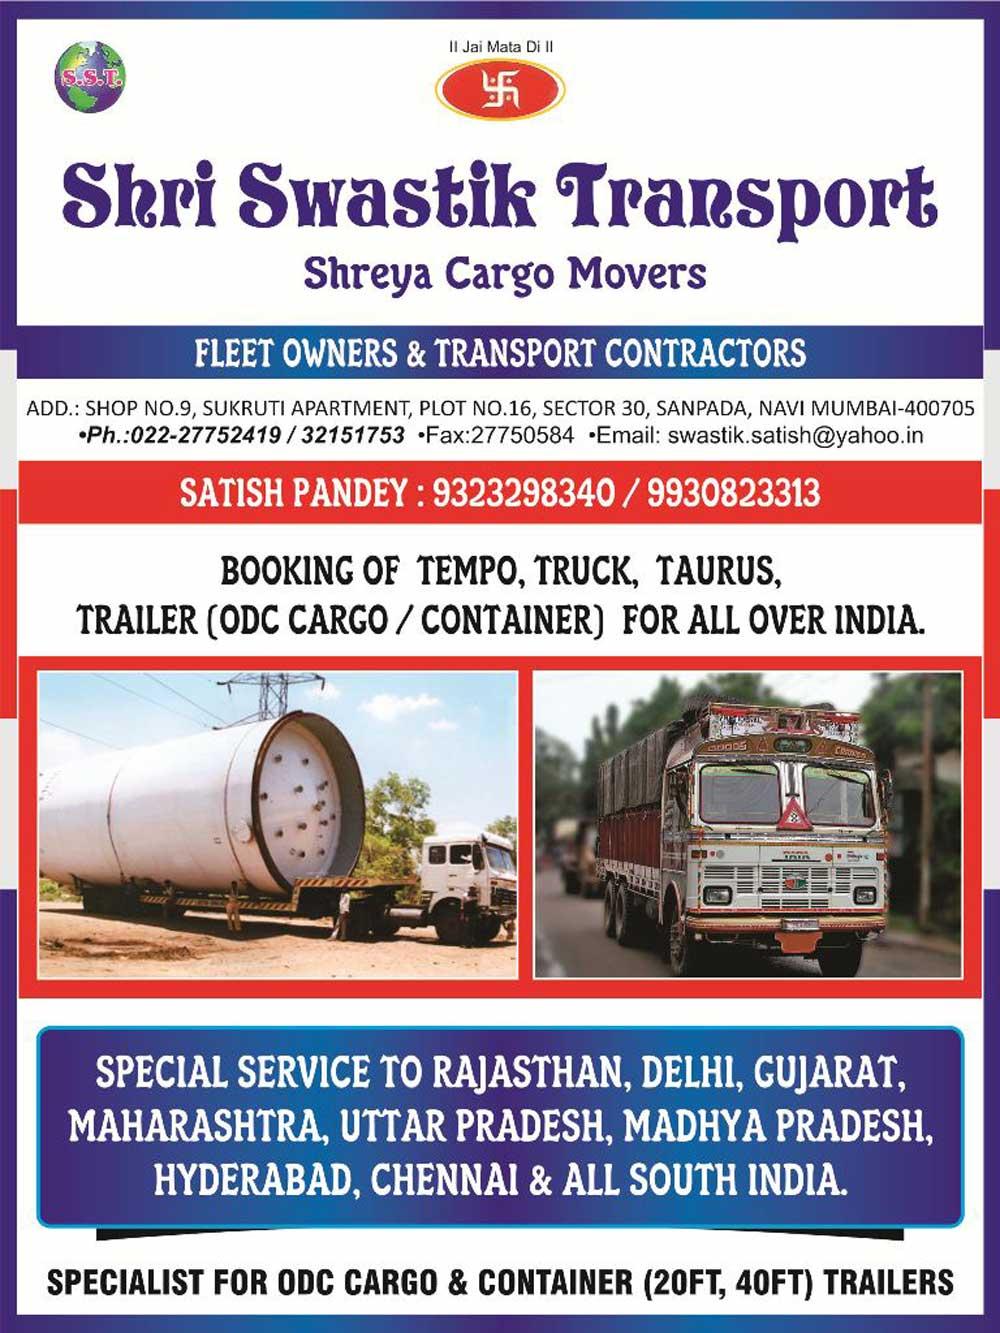 Shri Swastik Transport